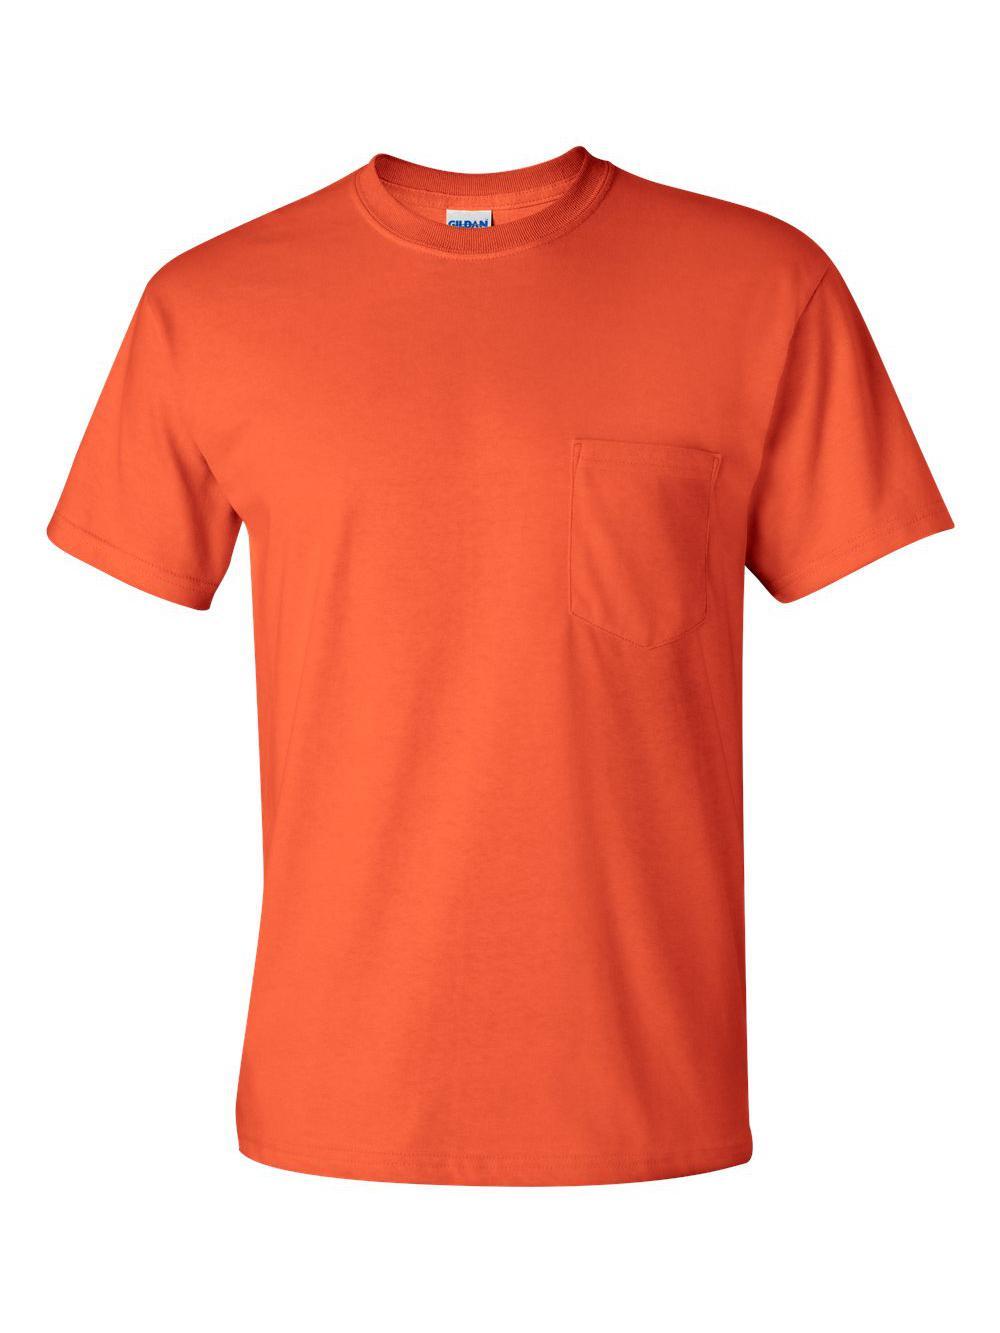 Gildan-Ultra-Cotton-T-Shirt-with-a-Pocket-2300 thumbnail 24